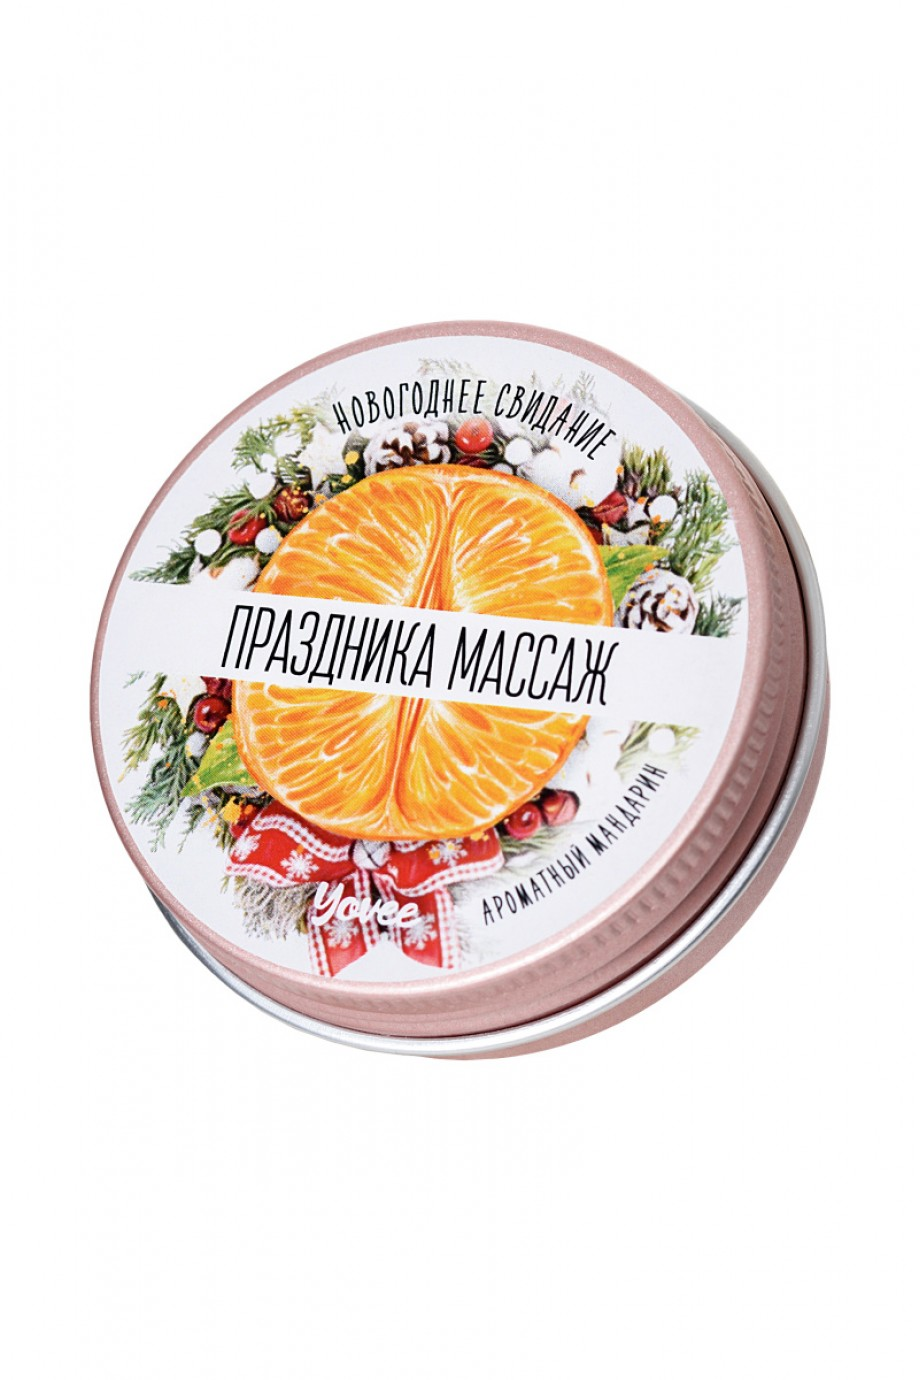 Массажная свеча Yovee by Toyfa «Праздника массаж», с ароматом мандарина, 30 мл